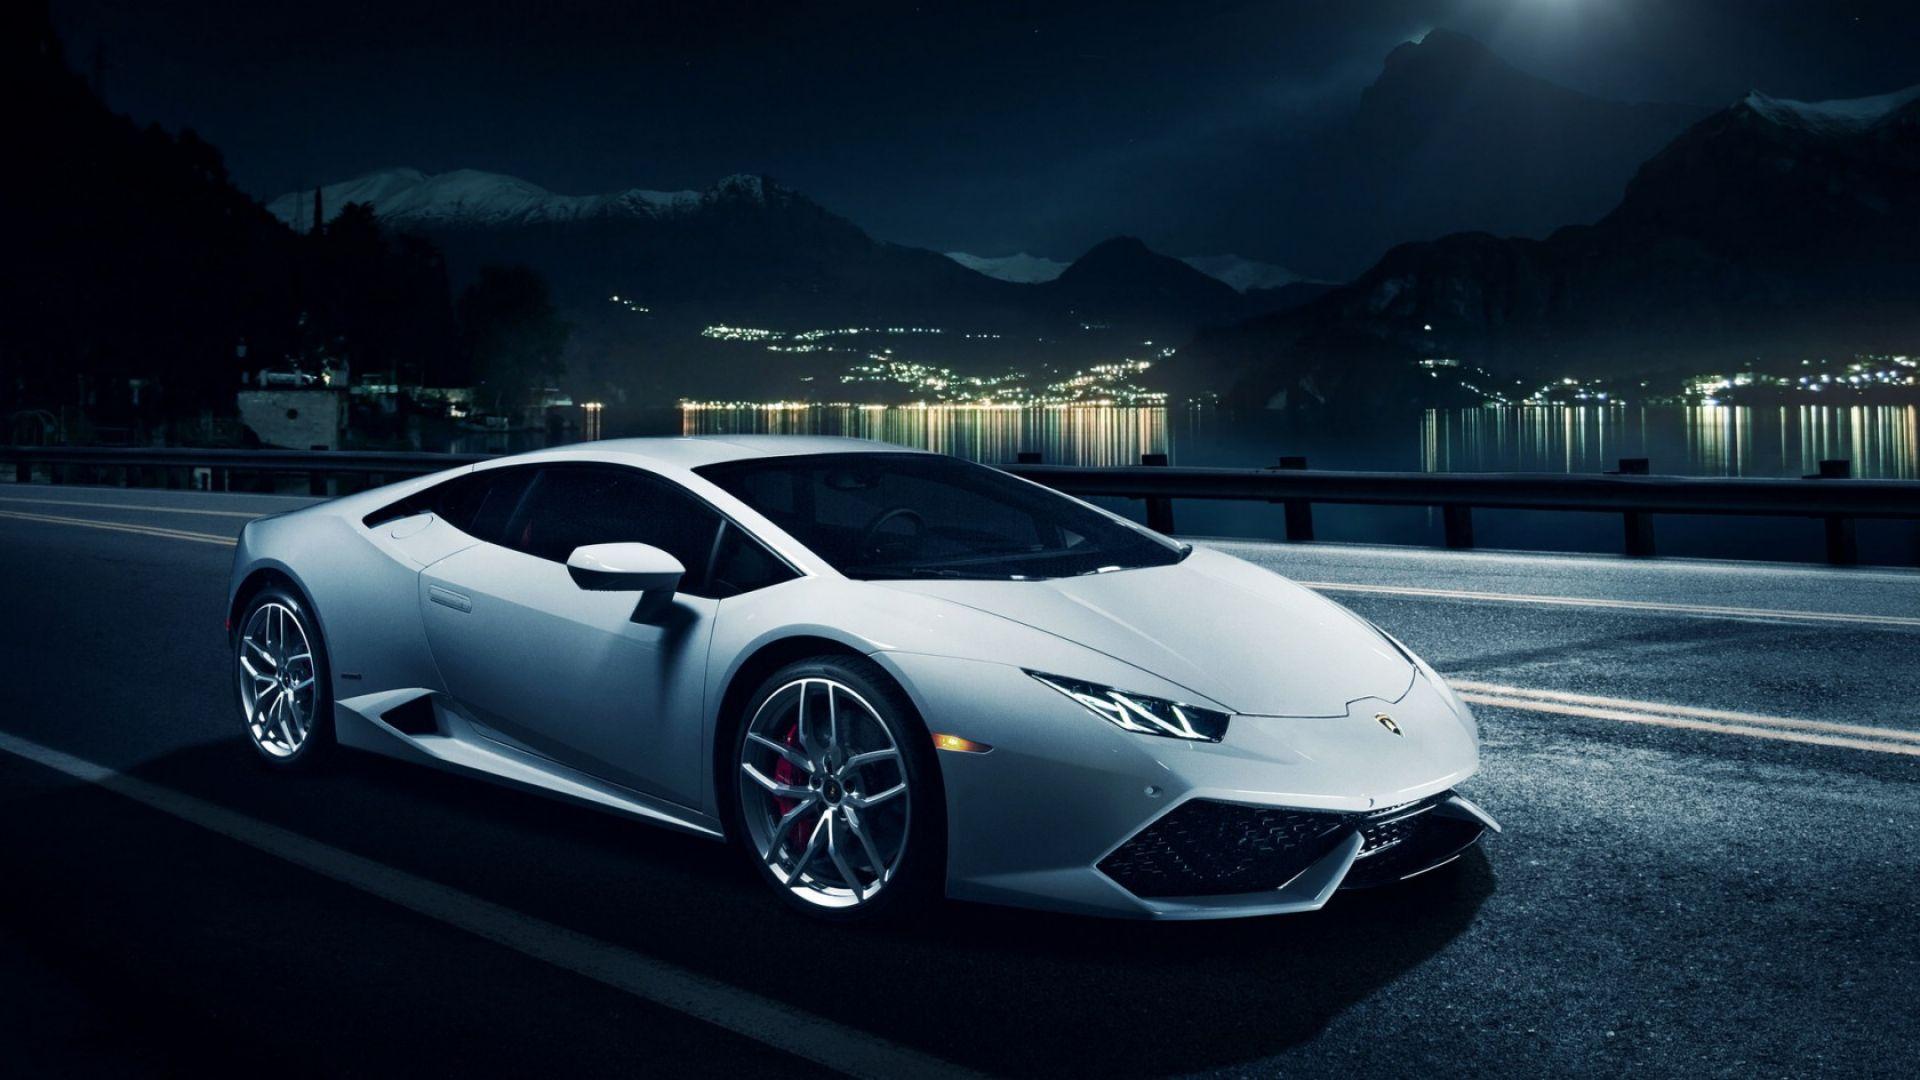 6c7d0b15722f67ea55ef53e837a7a72a Breathtaking Price Of Lamborghini Huracán Lp 610 4 Cars Trend